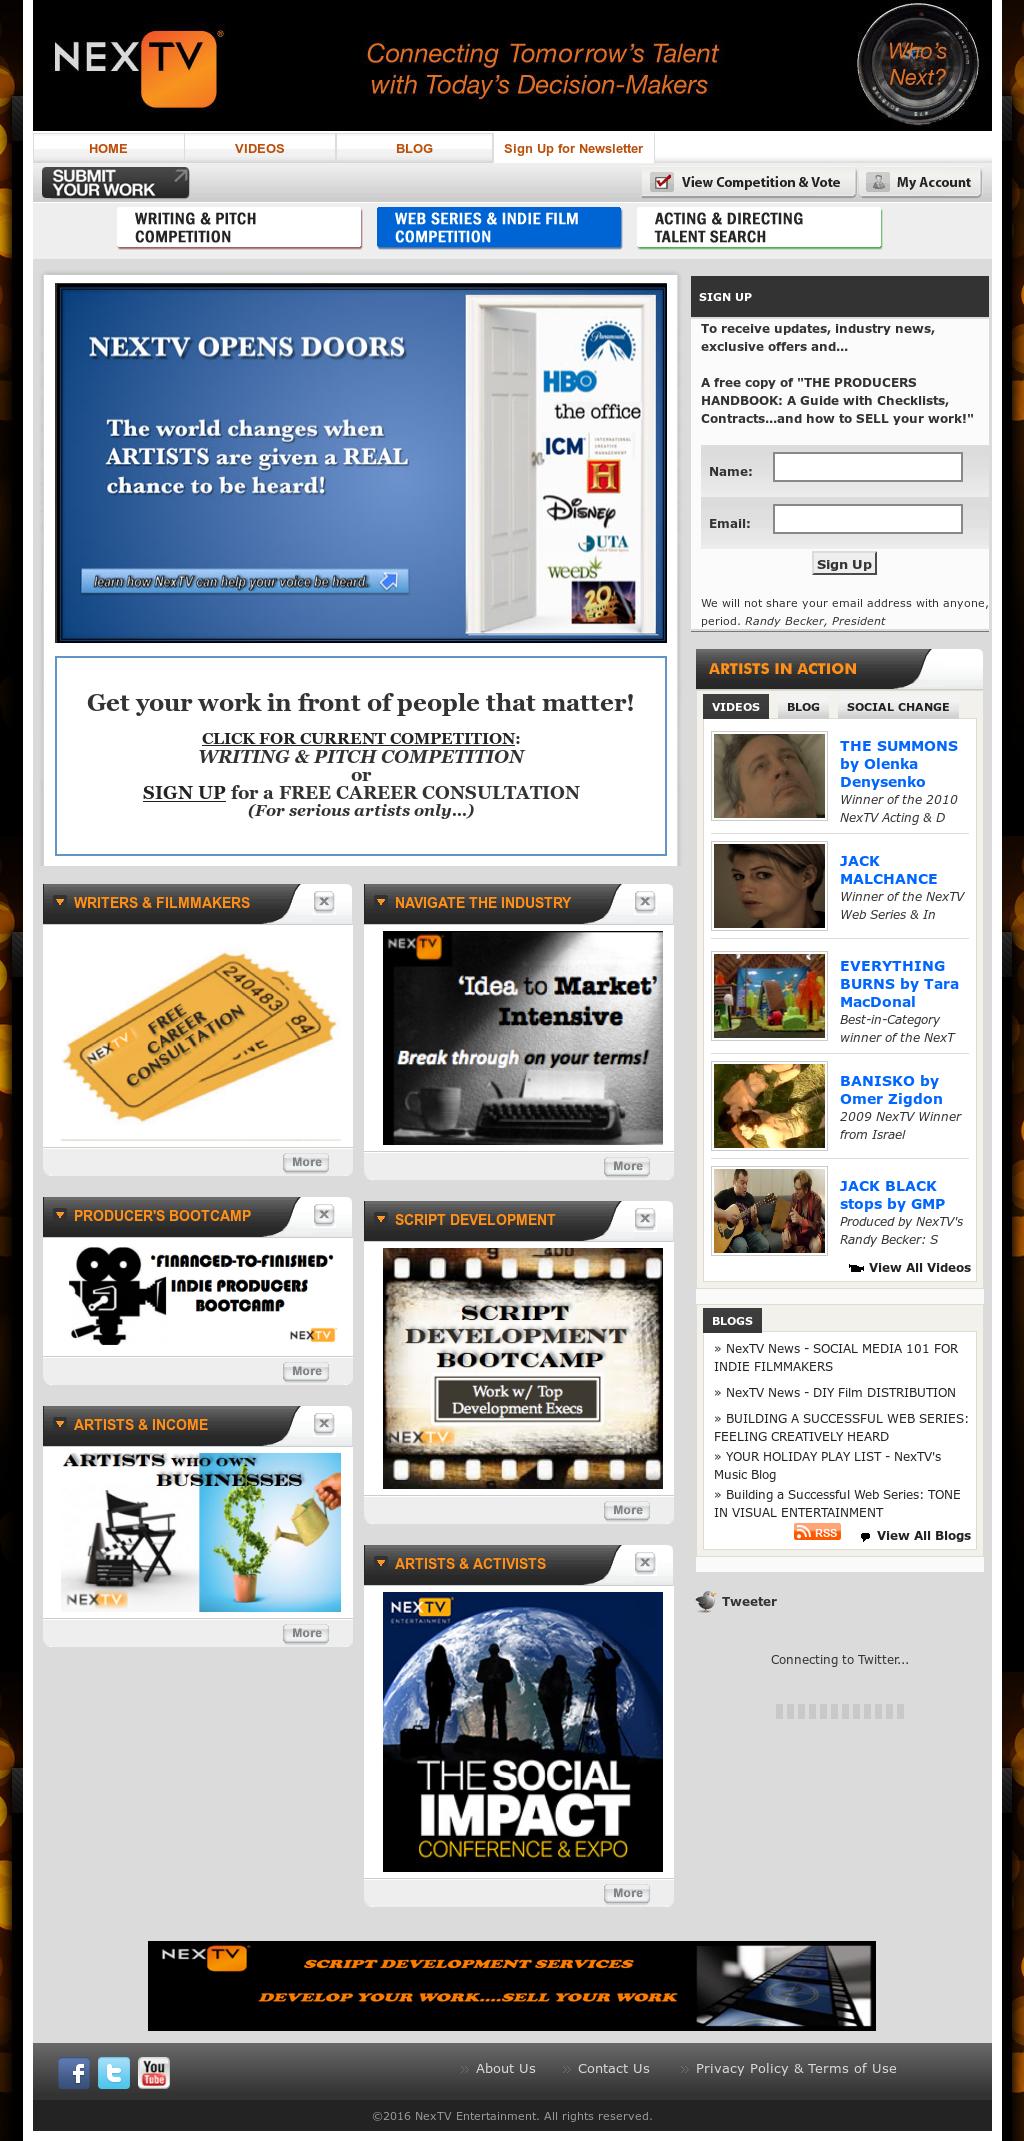 Nextv Entertainment Competitors, Revenue and Employees